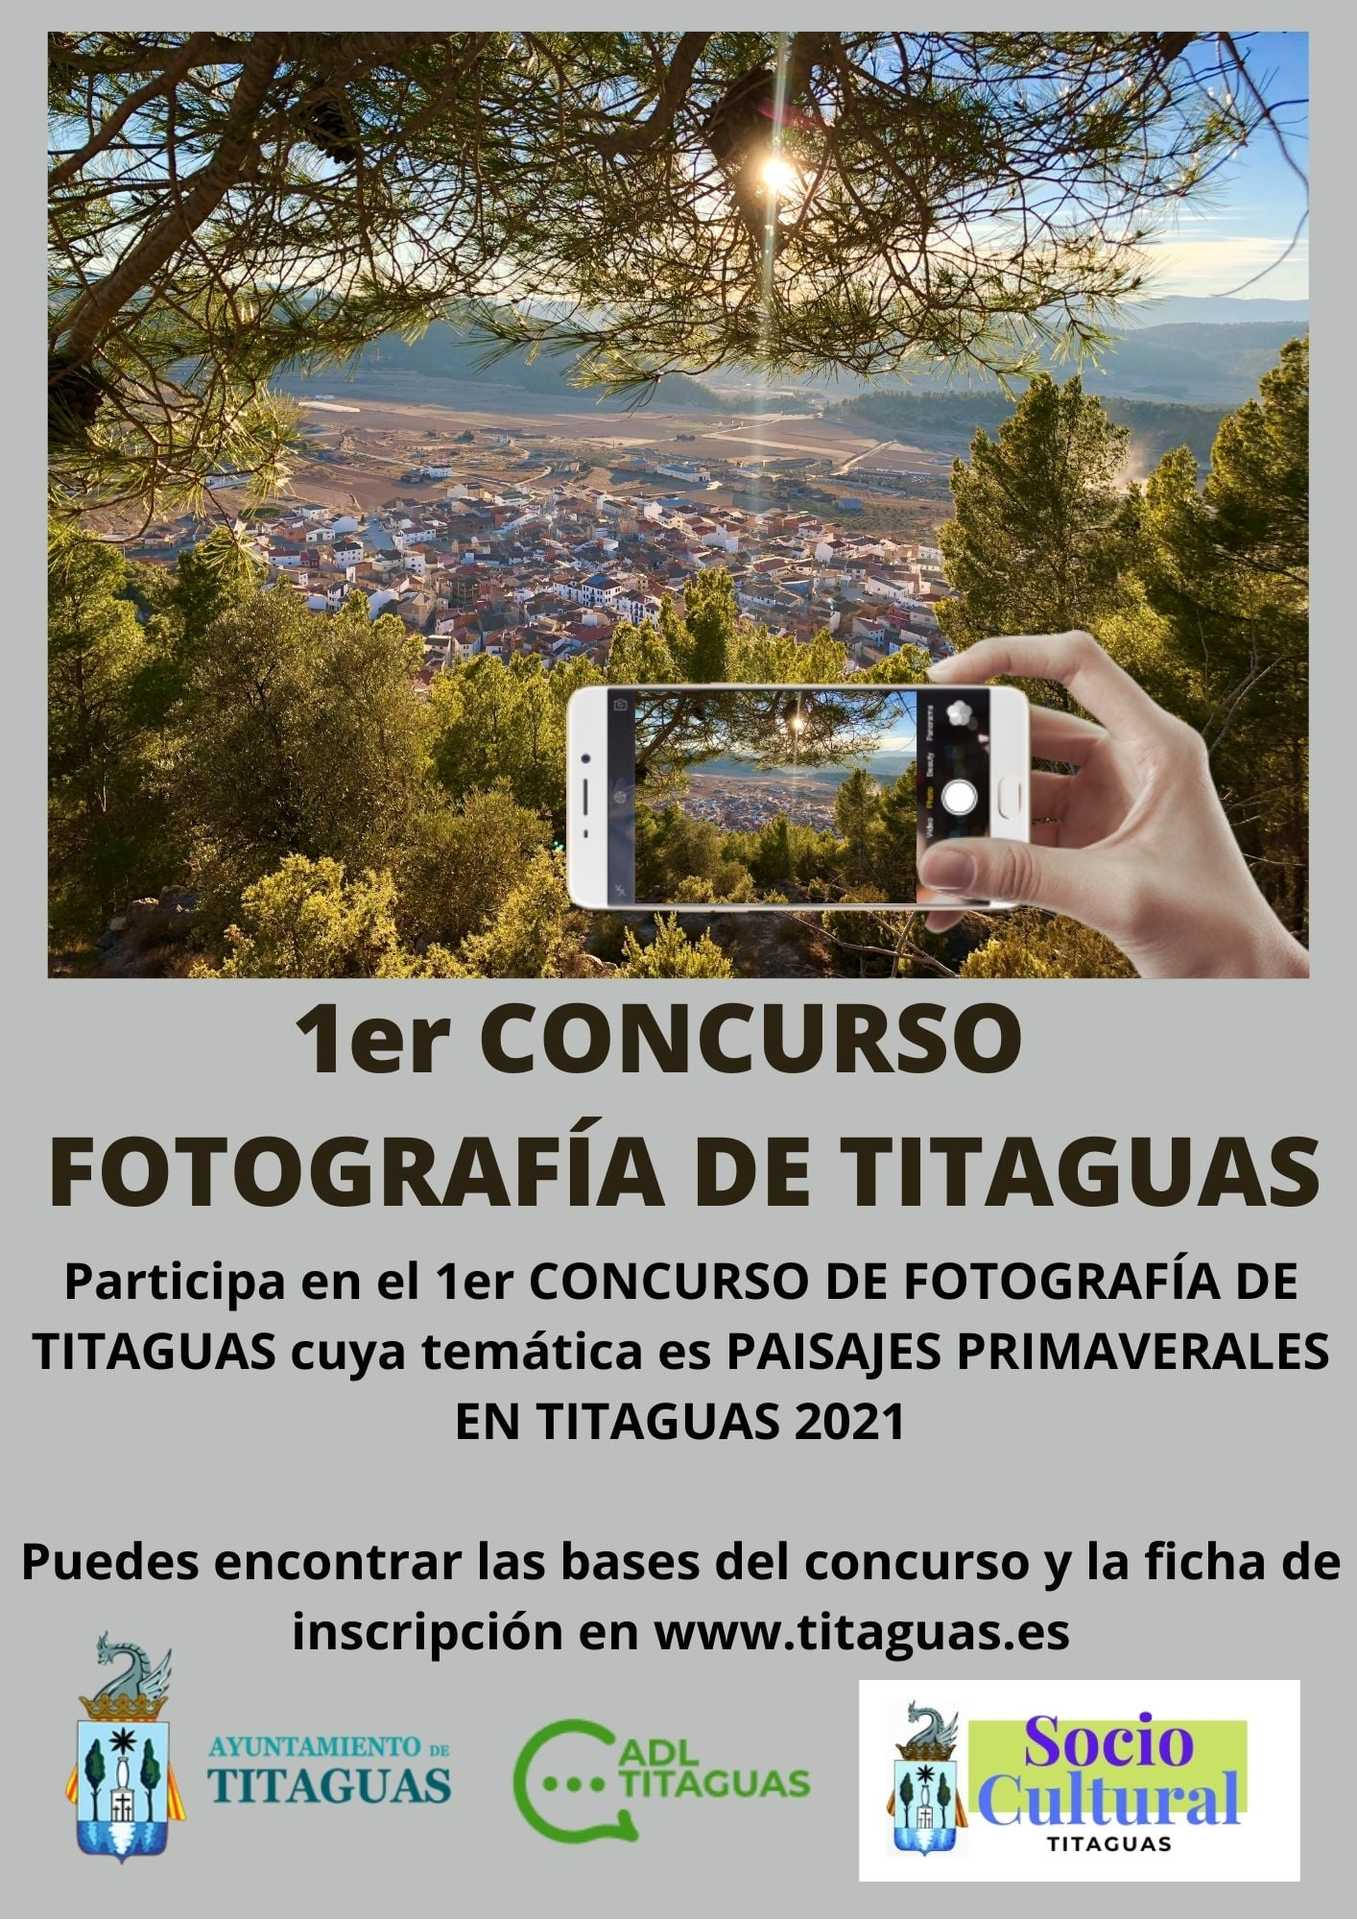 1er CONCURSO DE FOTOGRAFÍA DE TITAGUAS